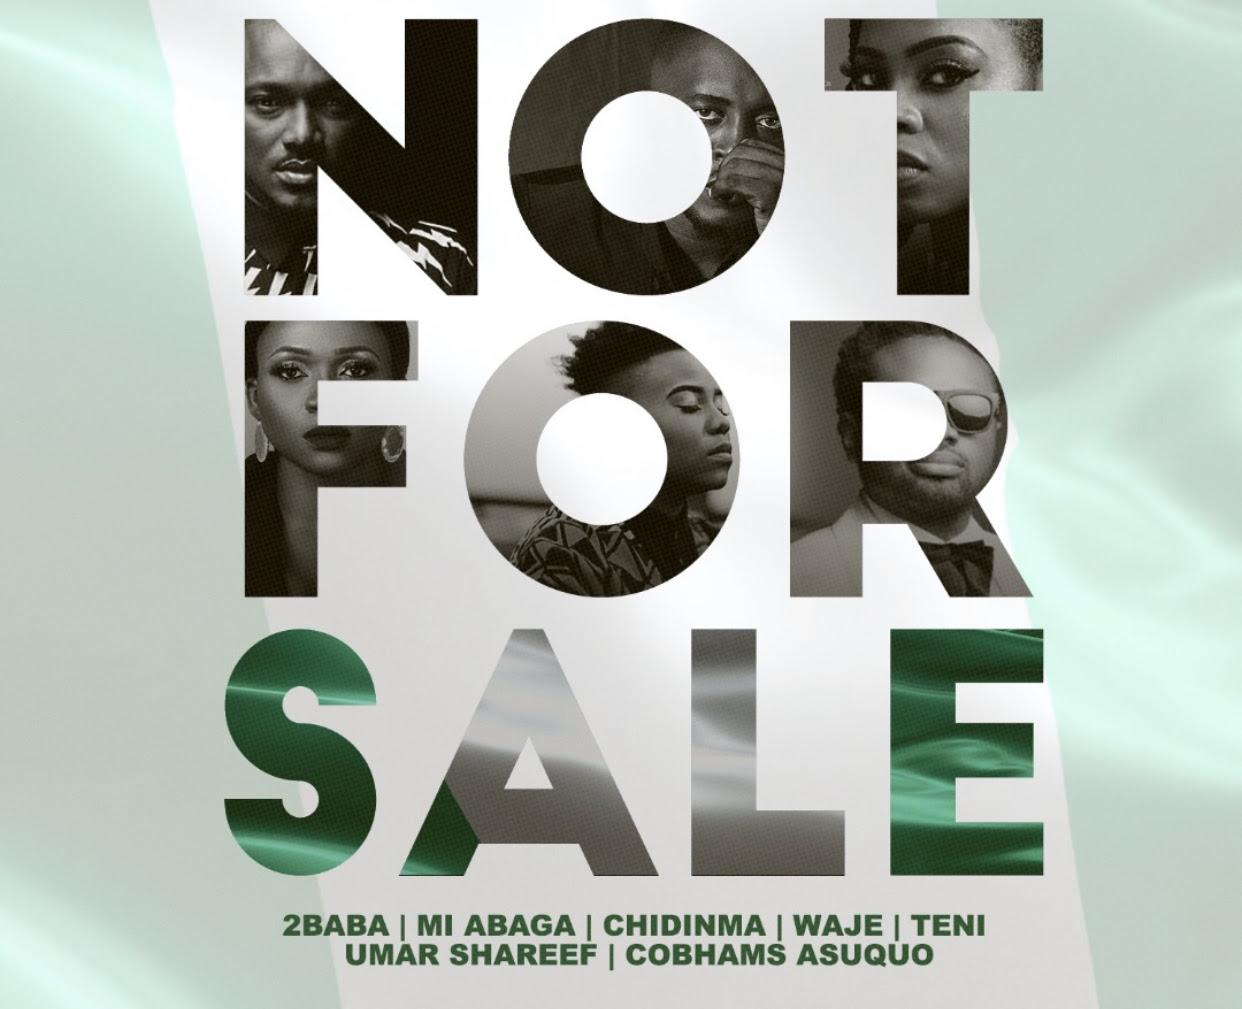 VIDEO: 2Baba x MI Abaga x Teni x Waje x Chidinma x Cobhams – Not For Sale